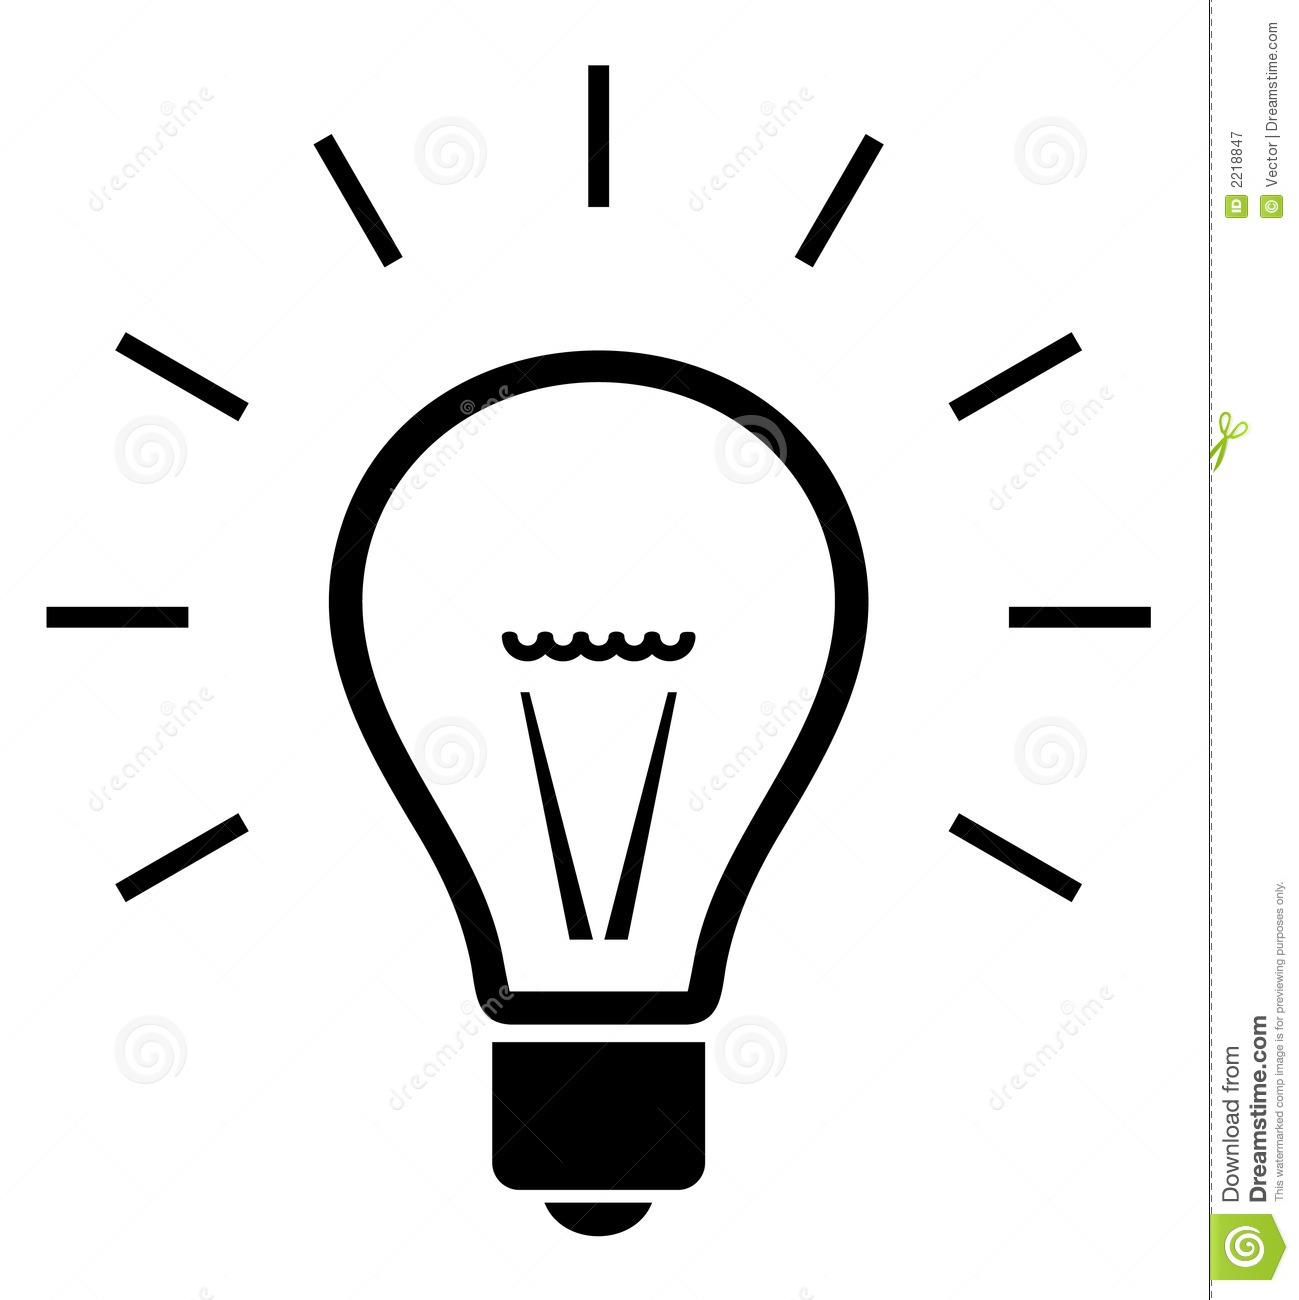 1299x1300 Light Bulb Clipart Black And White 101 Clip Art